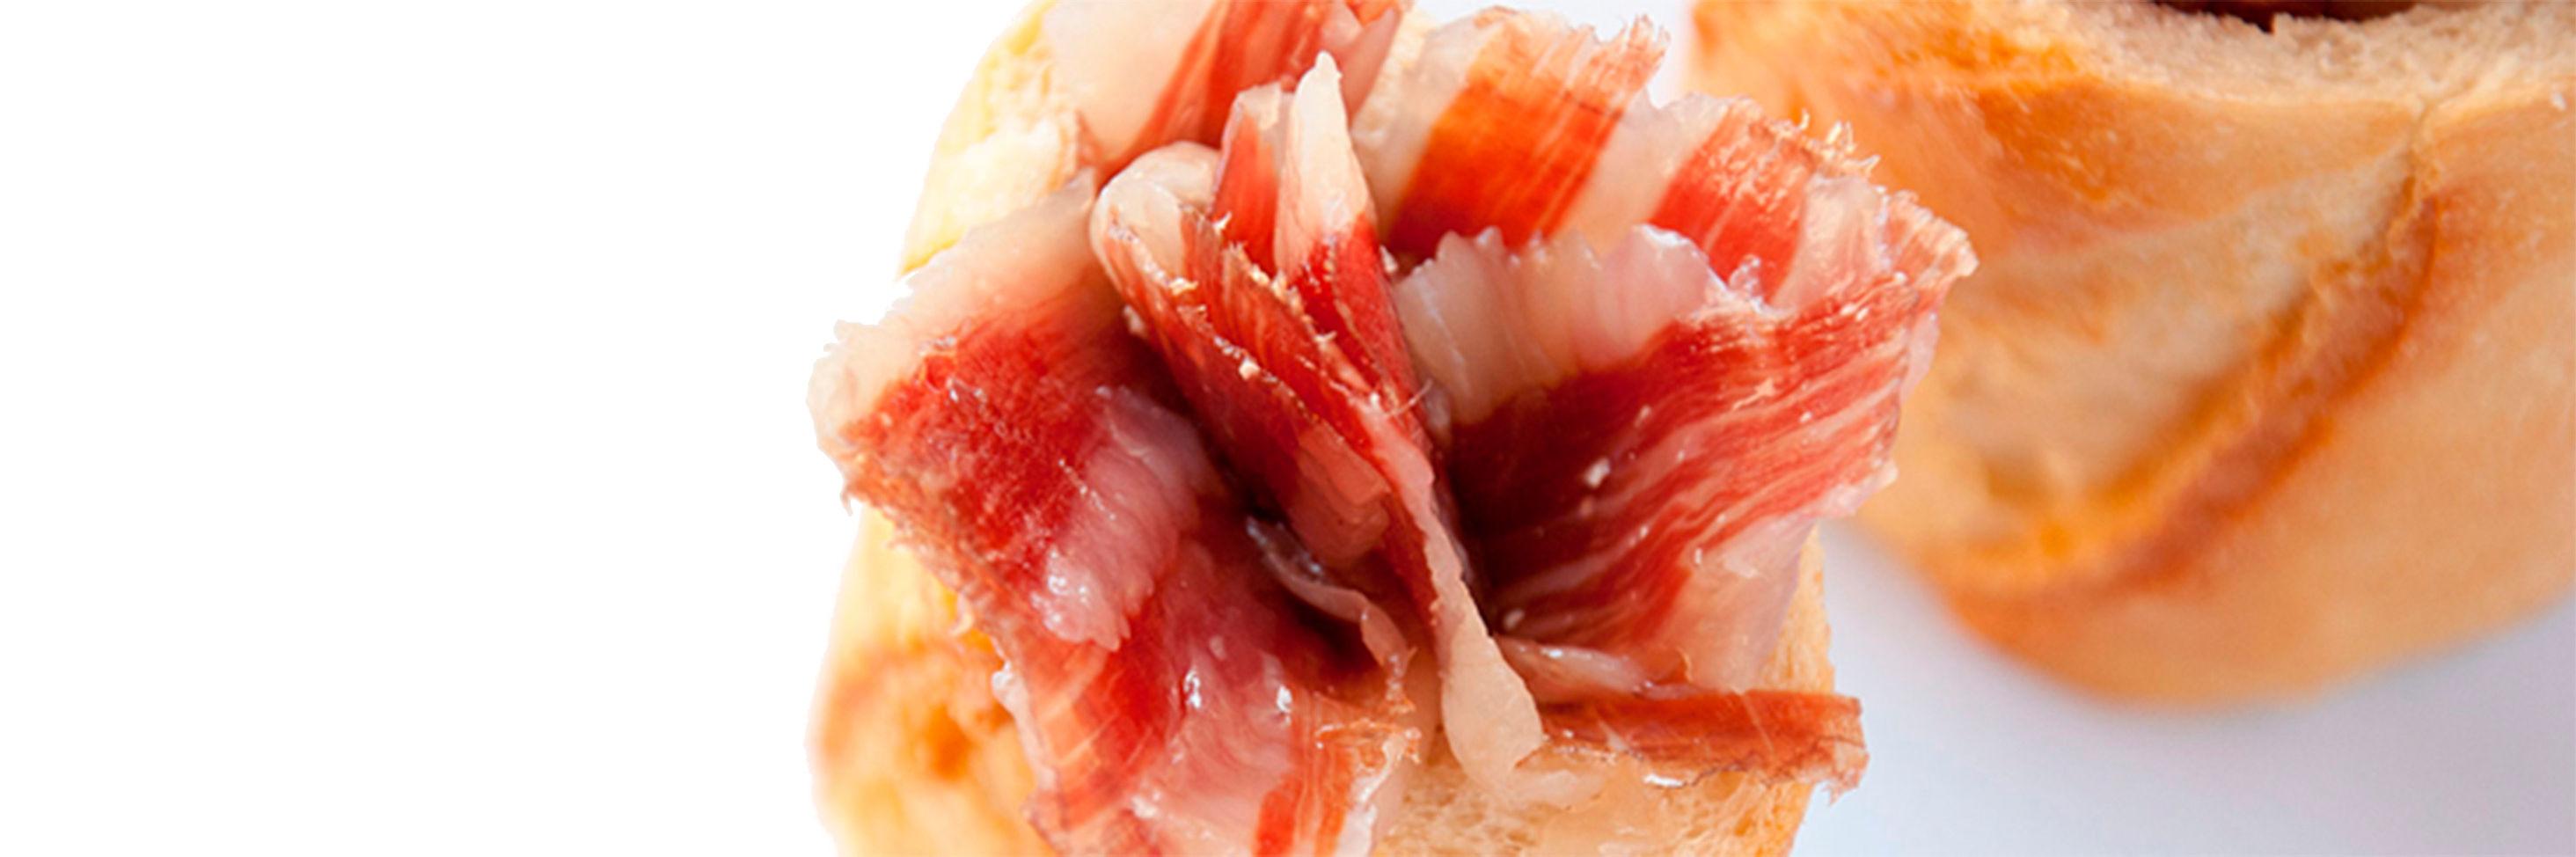 El mejor jamón pata negra directo de productores españoles